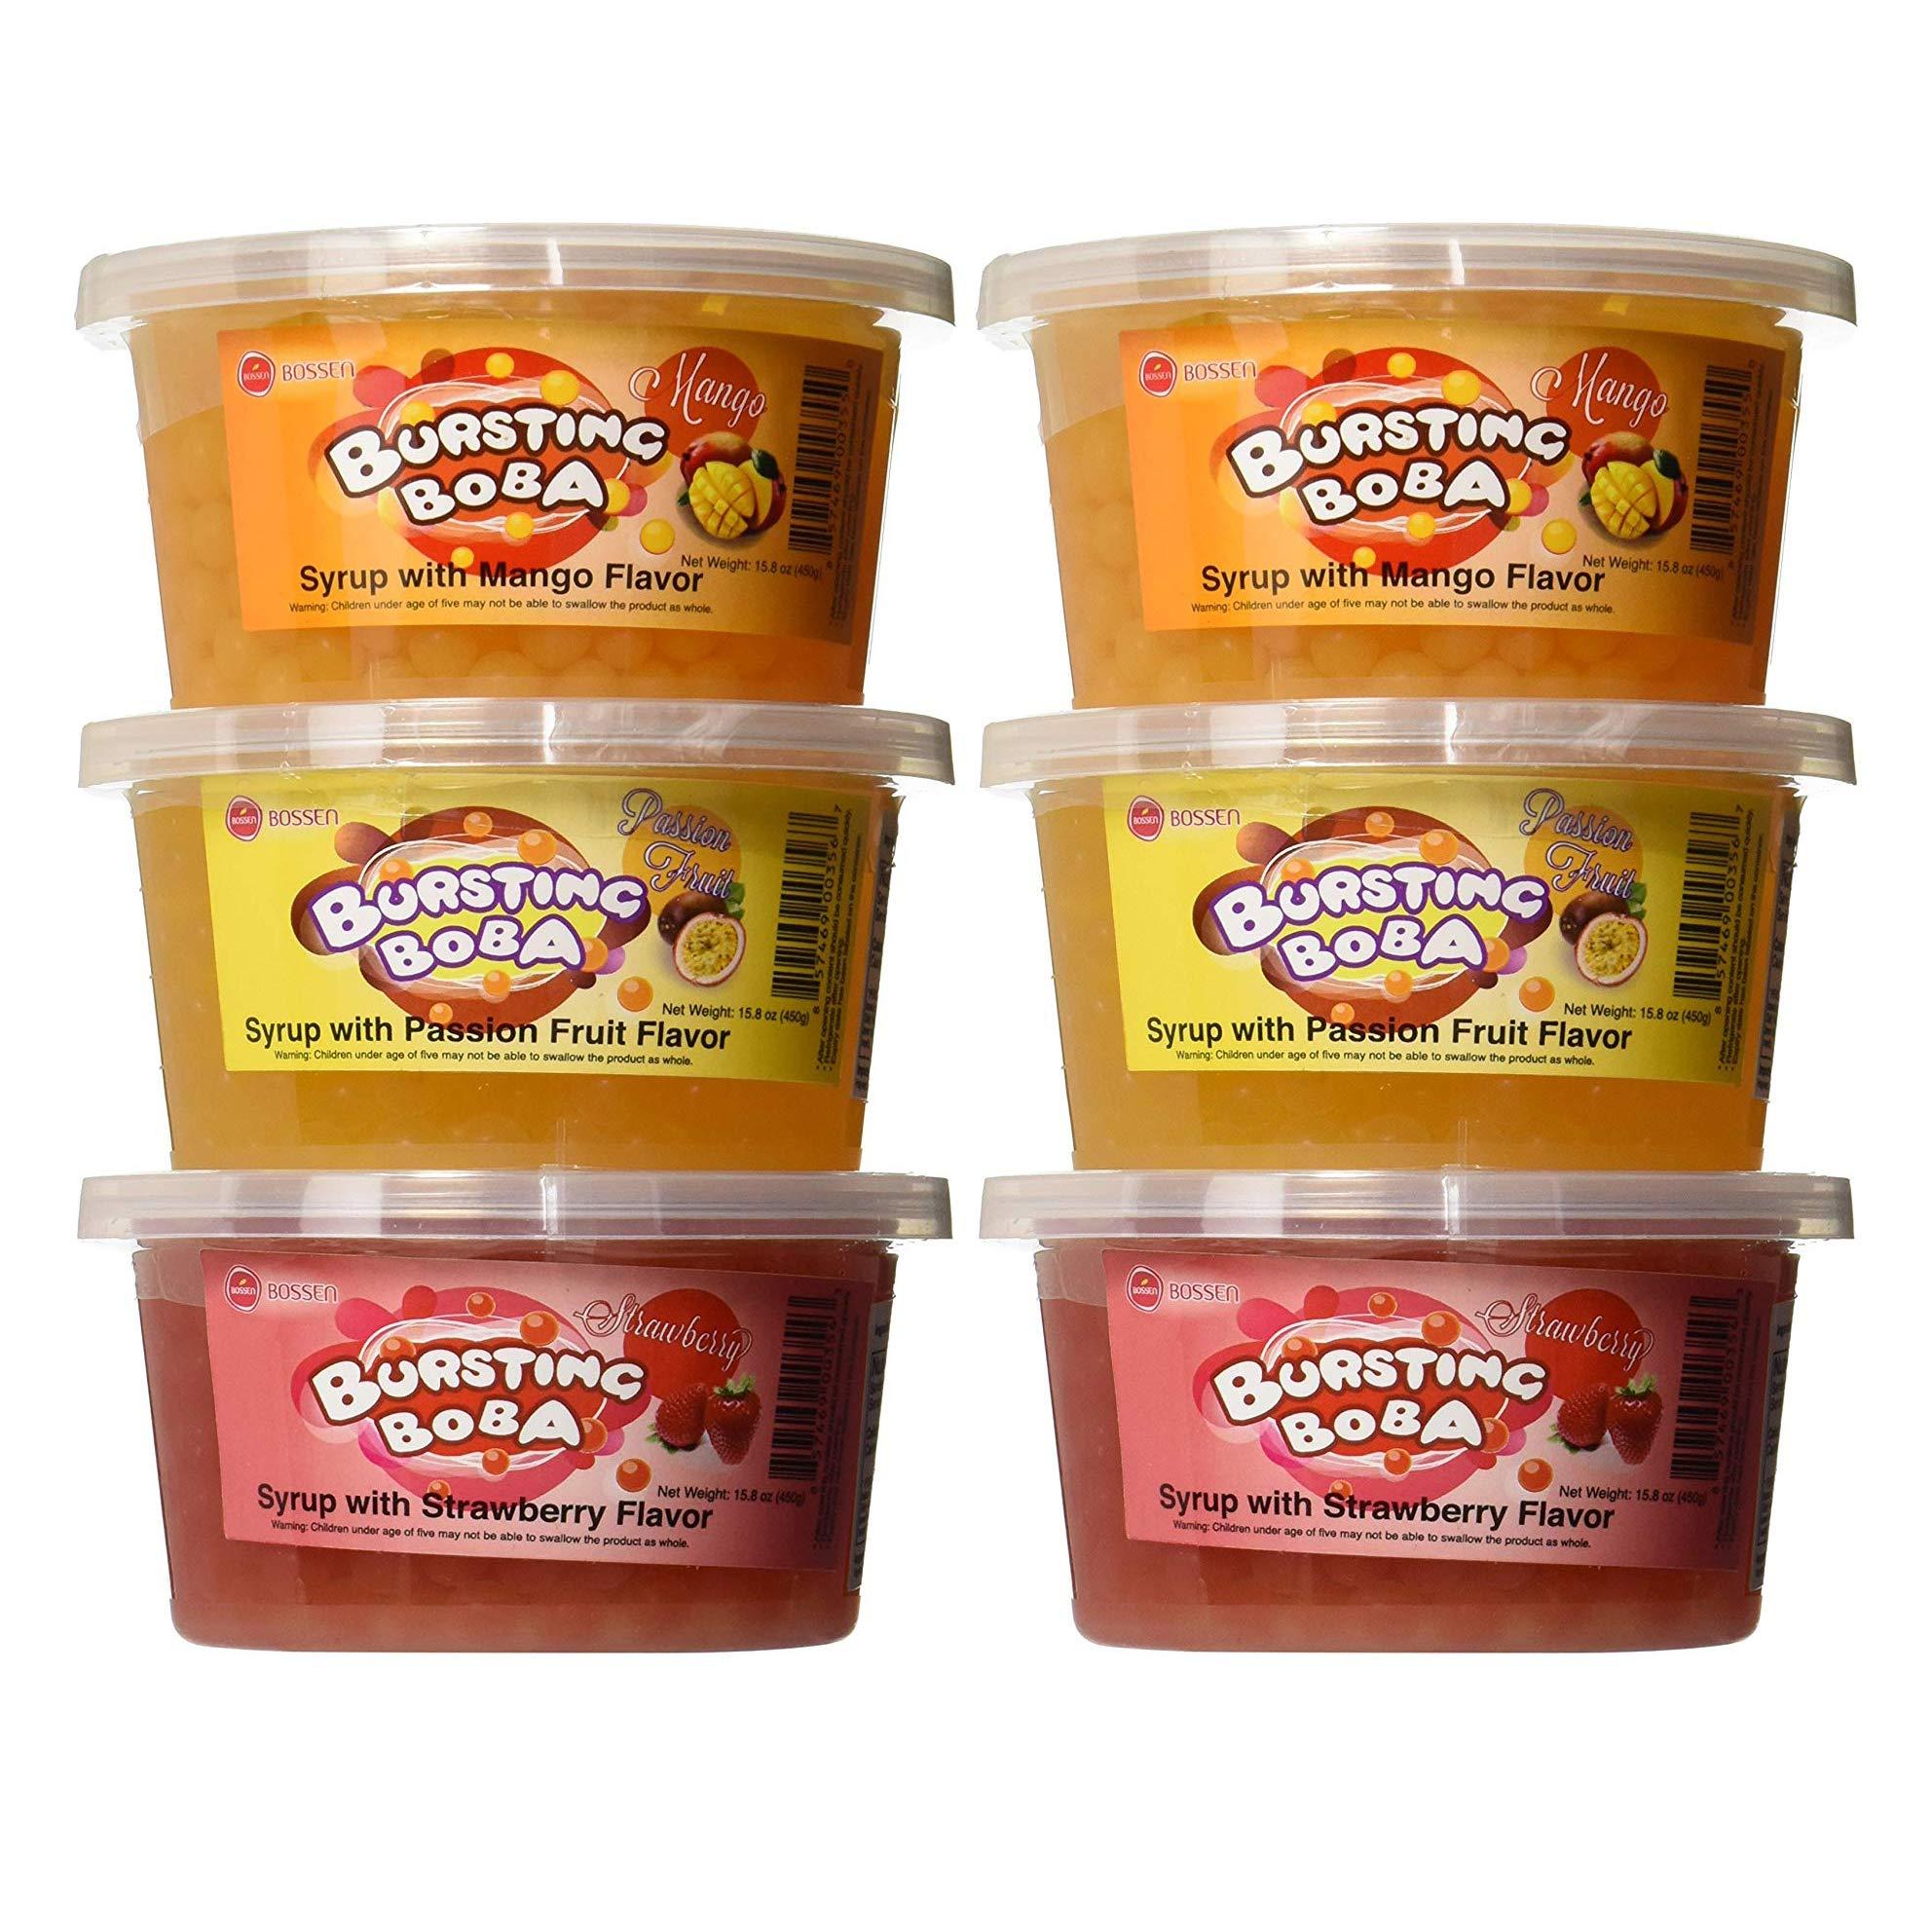 Bursting Popping Boba 3 Flavor Fun Pack 6 Pack - 2 Mango 2 Passion Fruit 2 Strawberry Bursting Boba